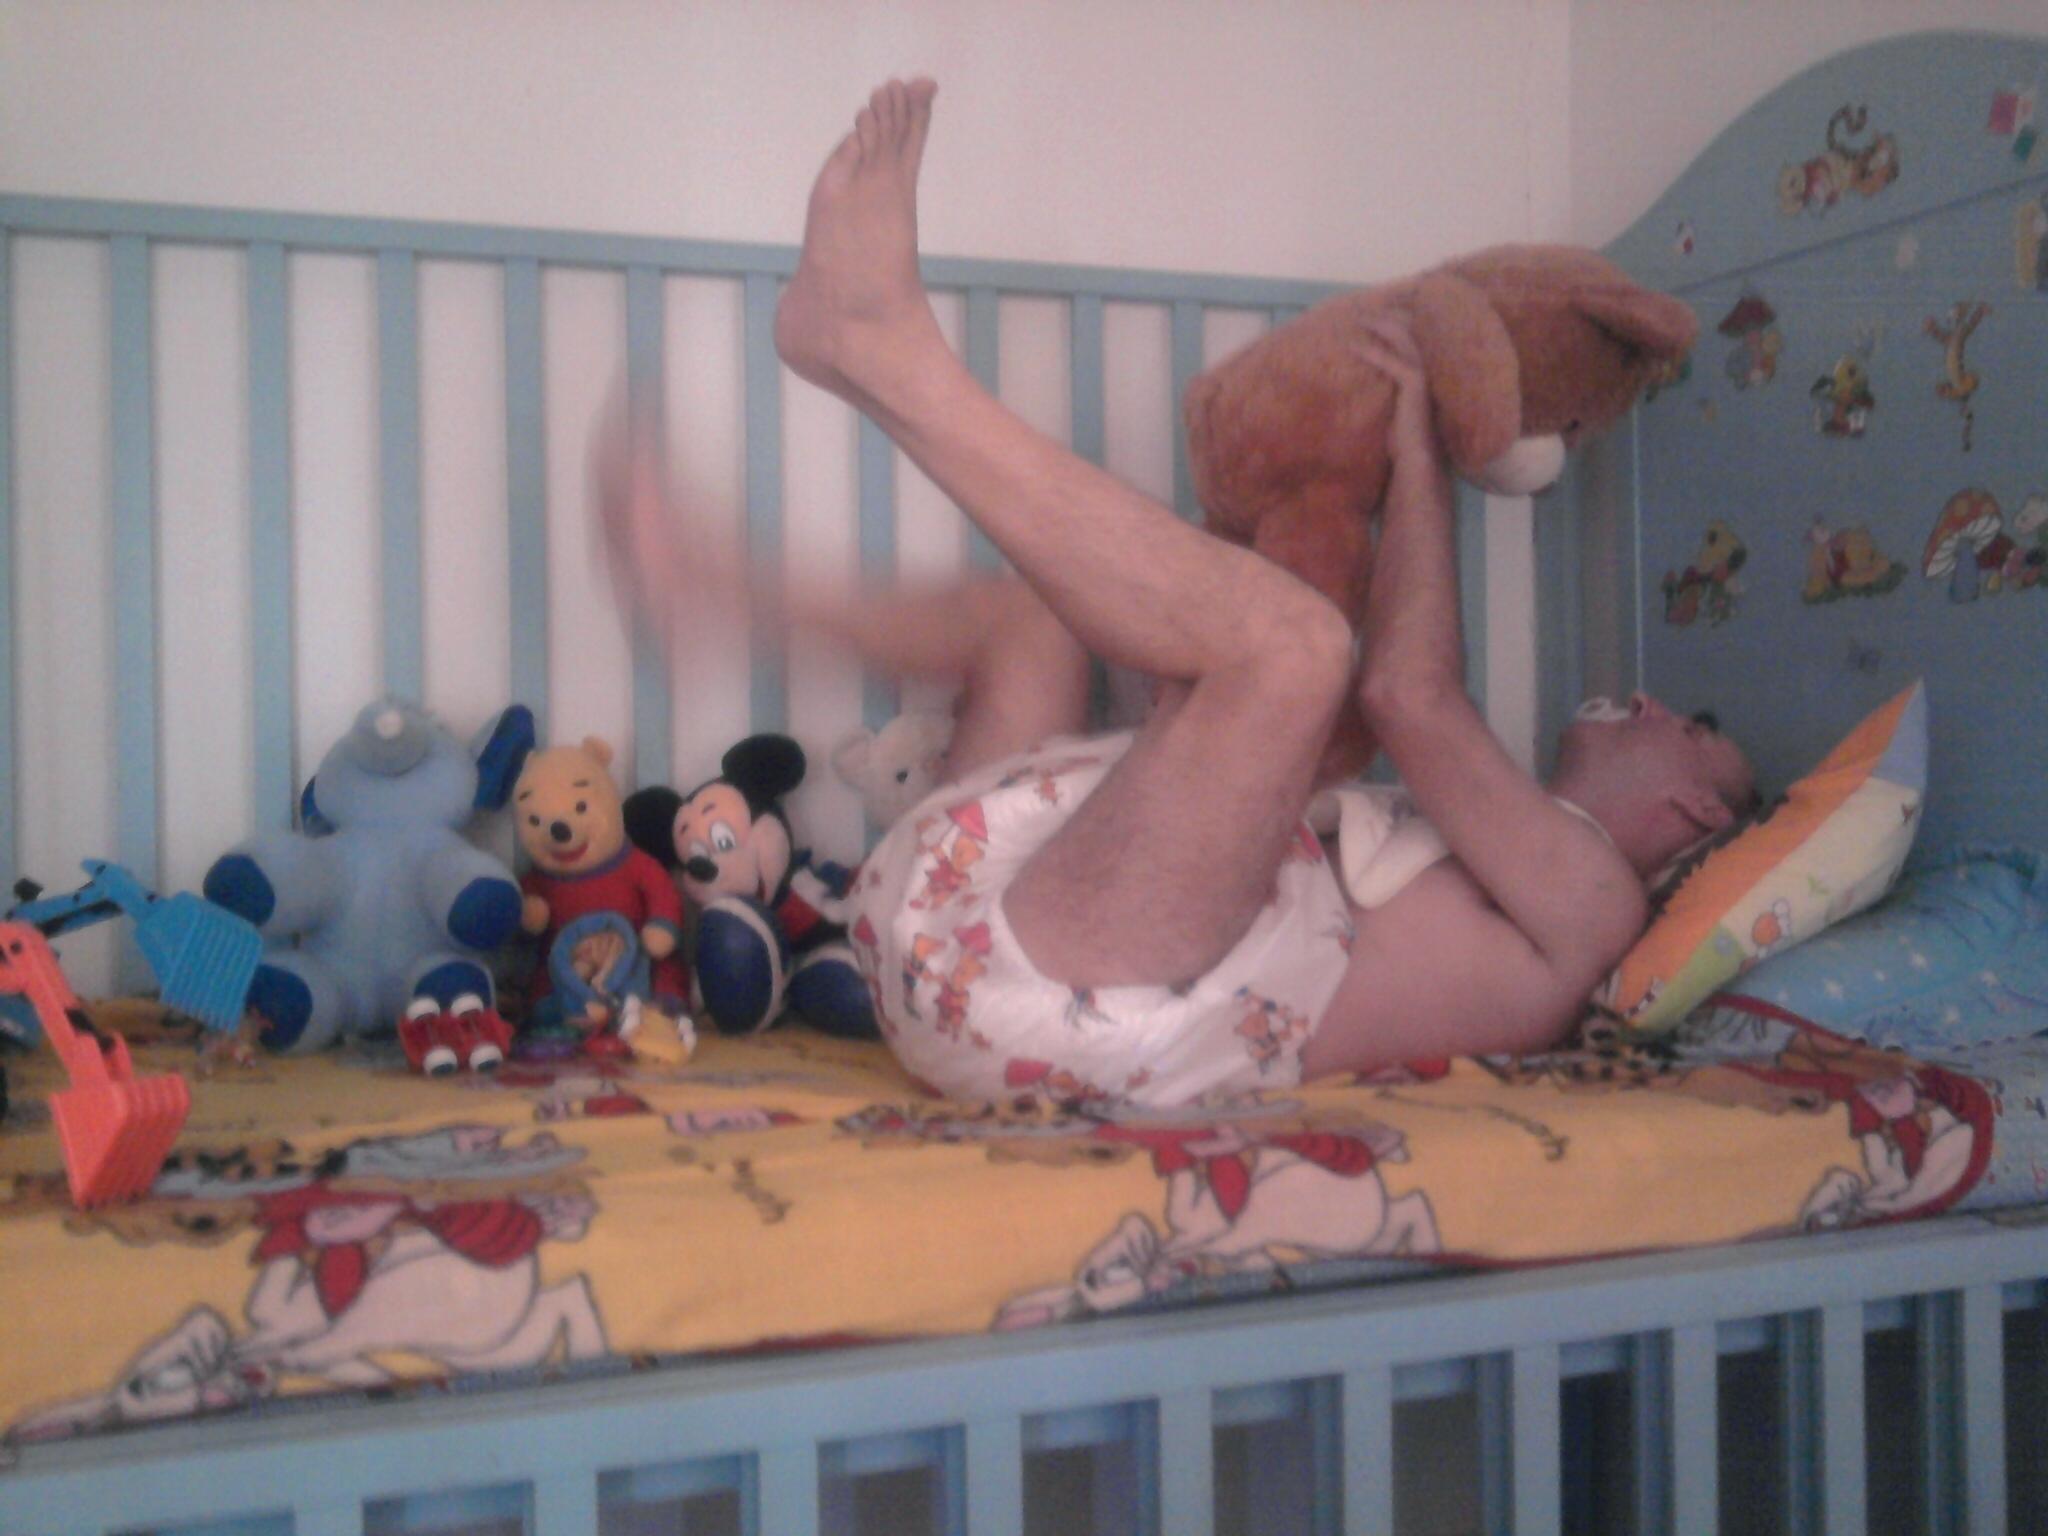 adult baby nuserys links